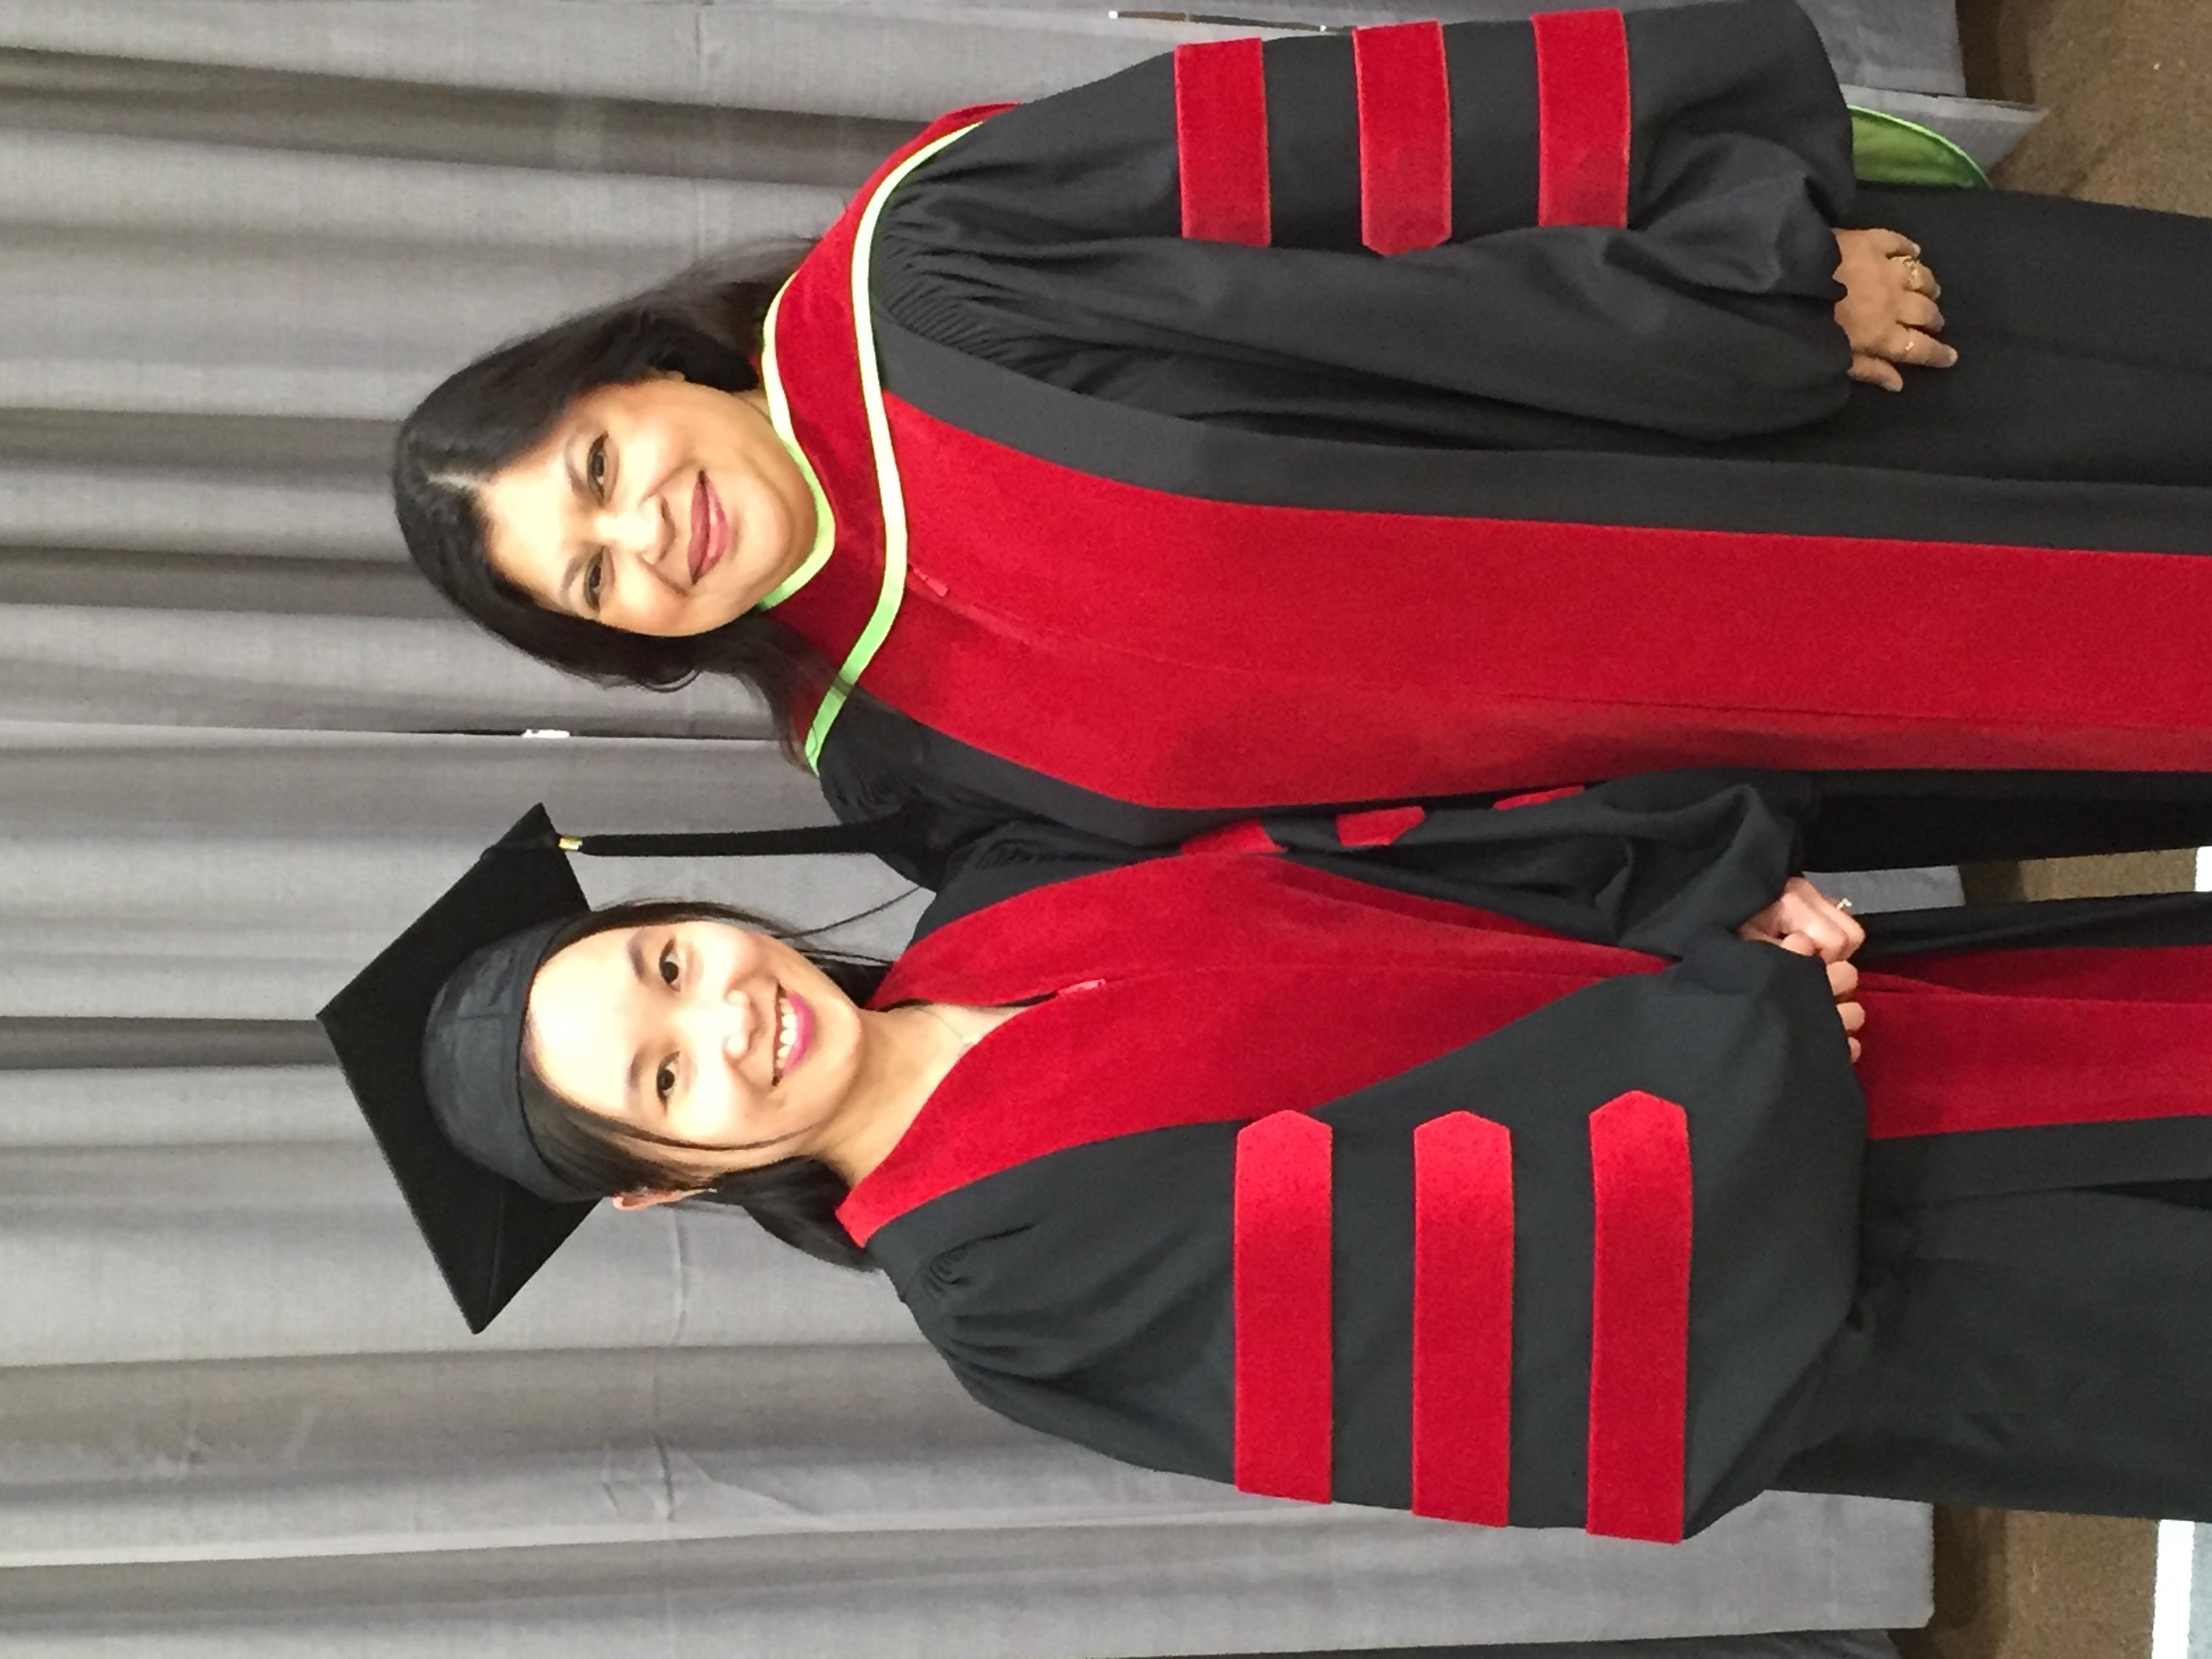 Congratulations Dr. Choi